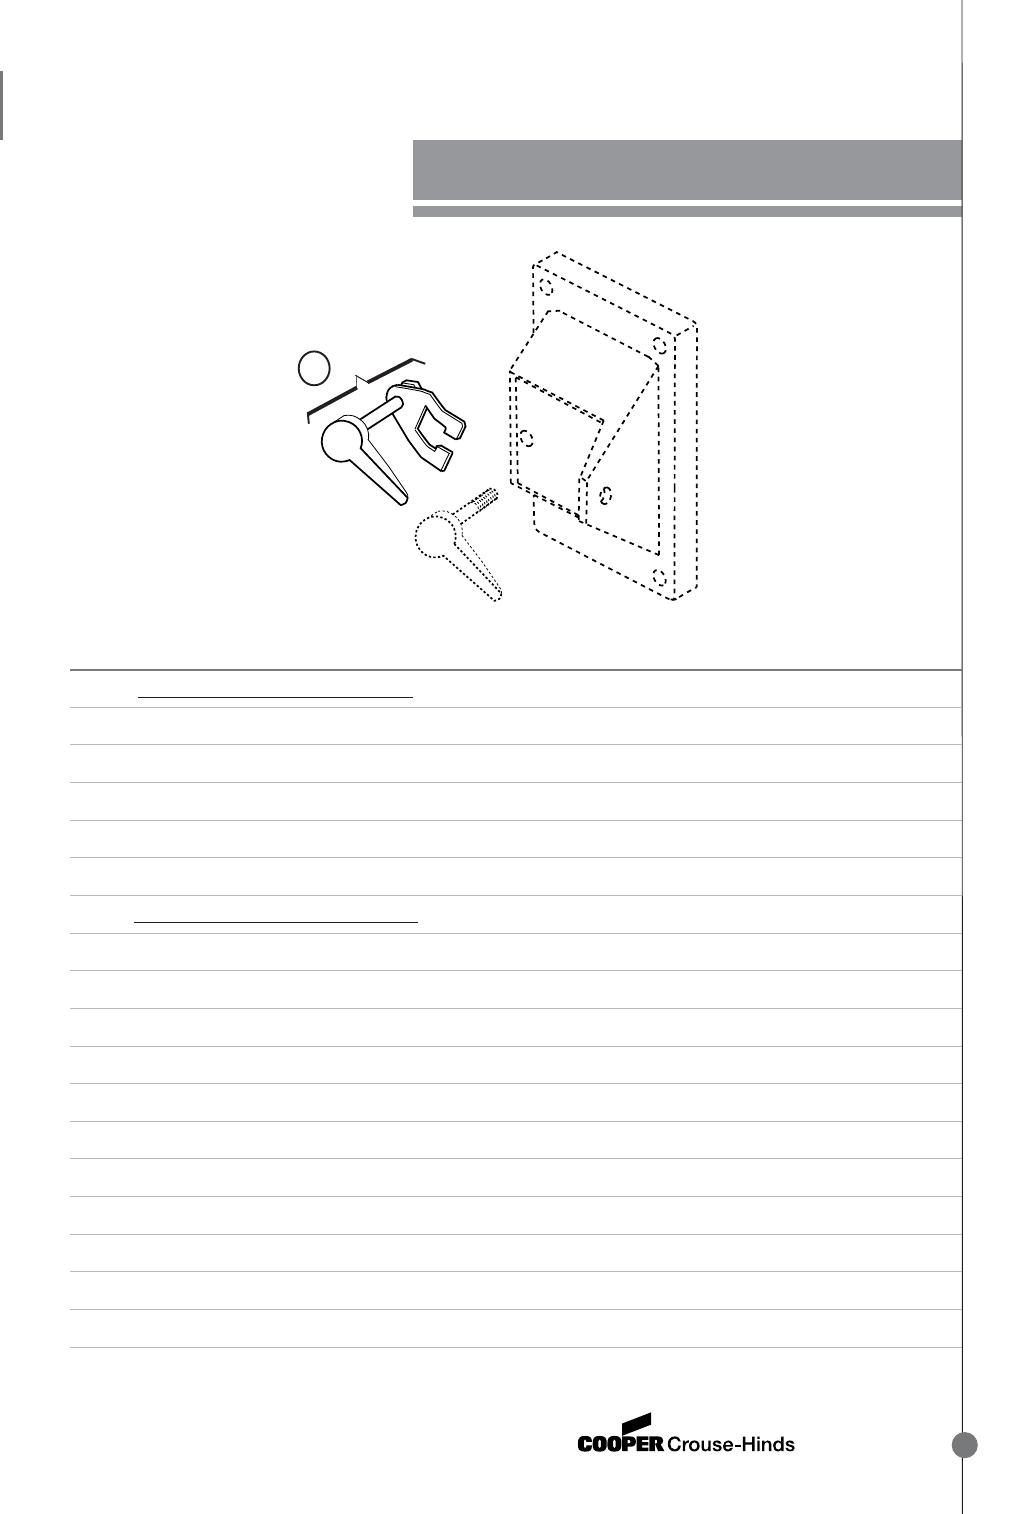 hoa wiring diagram 2002 saturn sc2 radio hand off auto selector switch